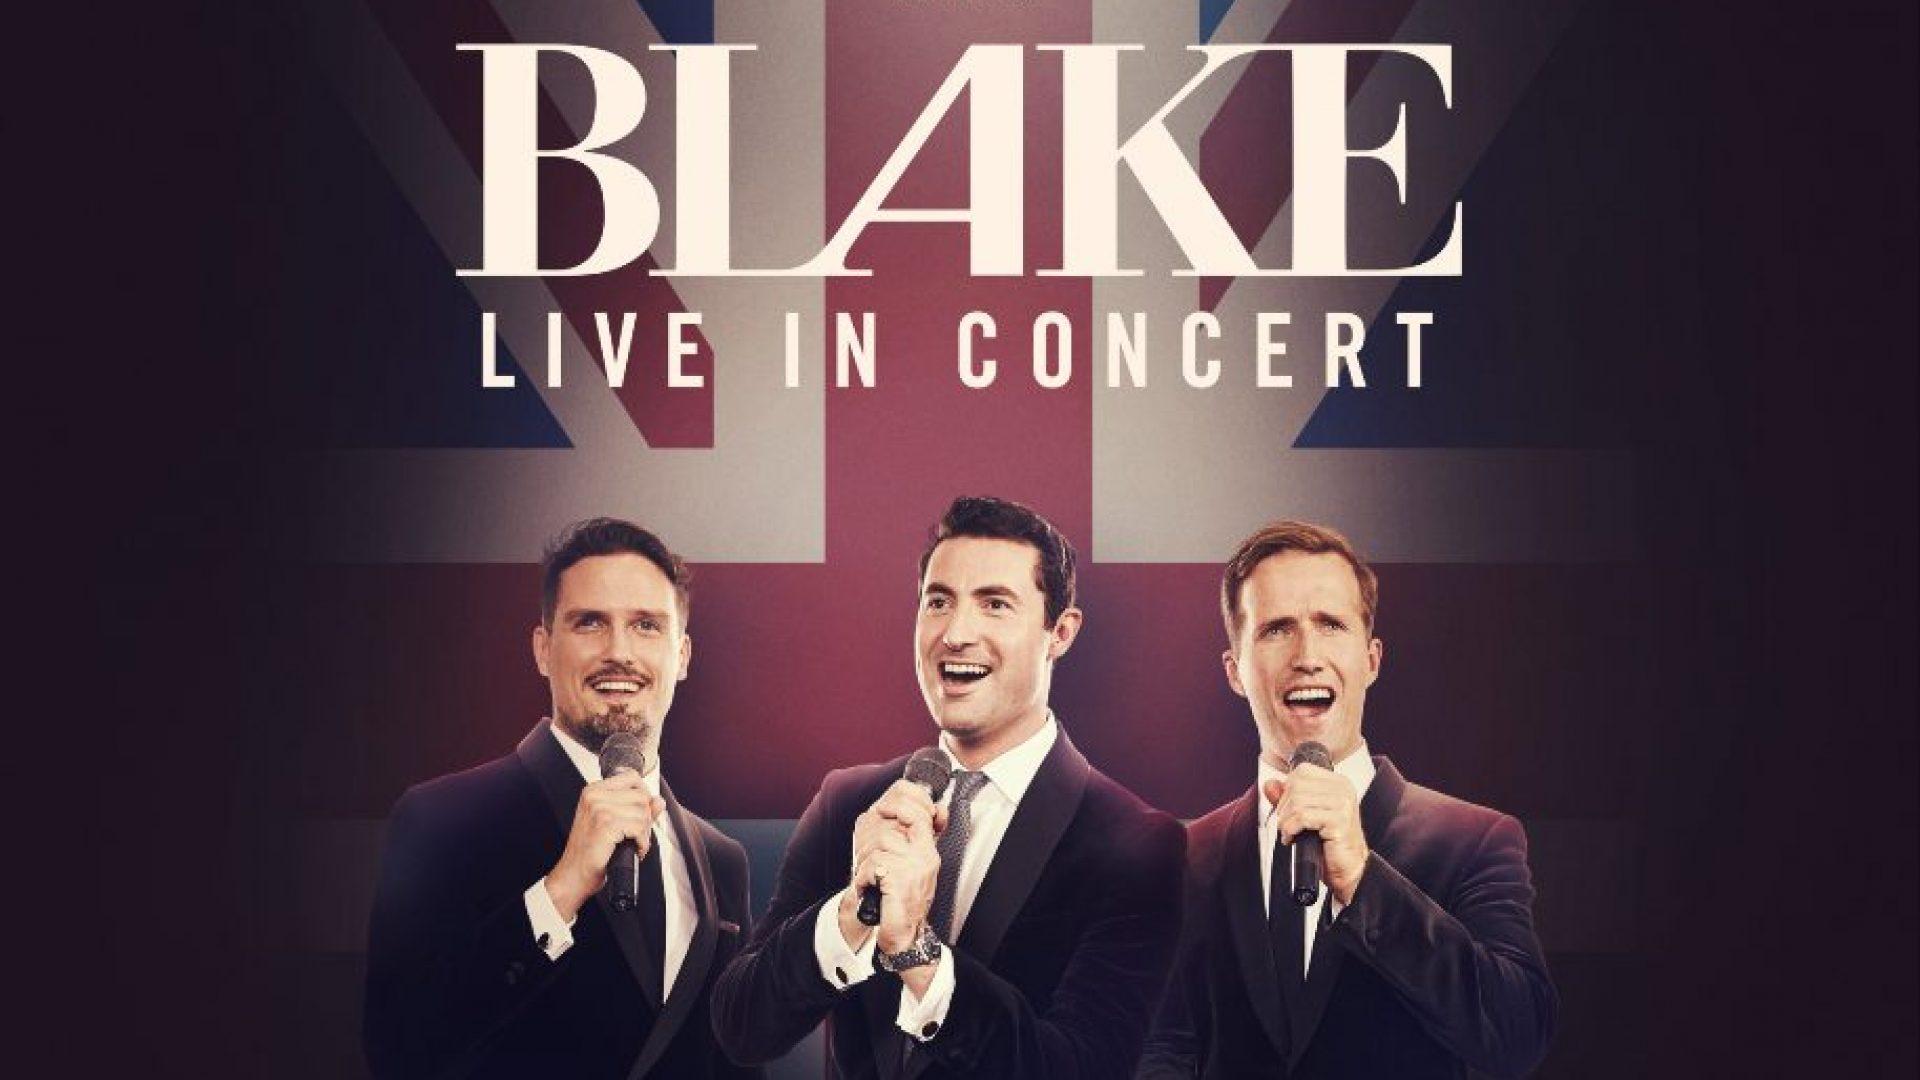 Blake Live in Concert